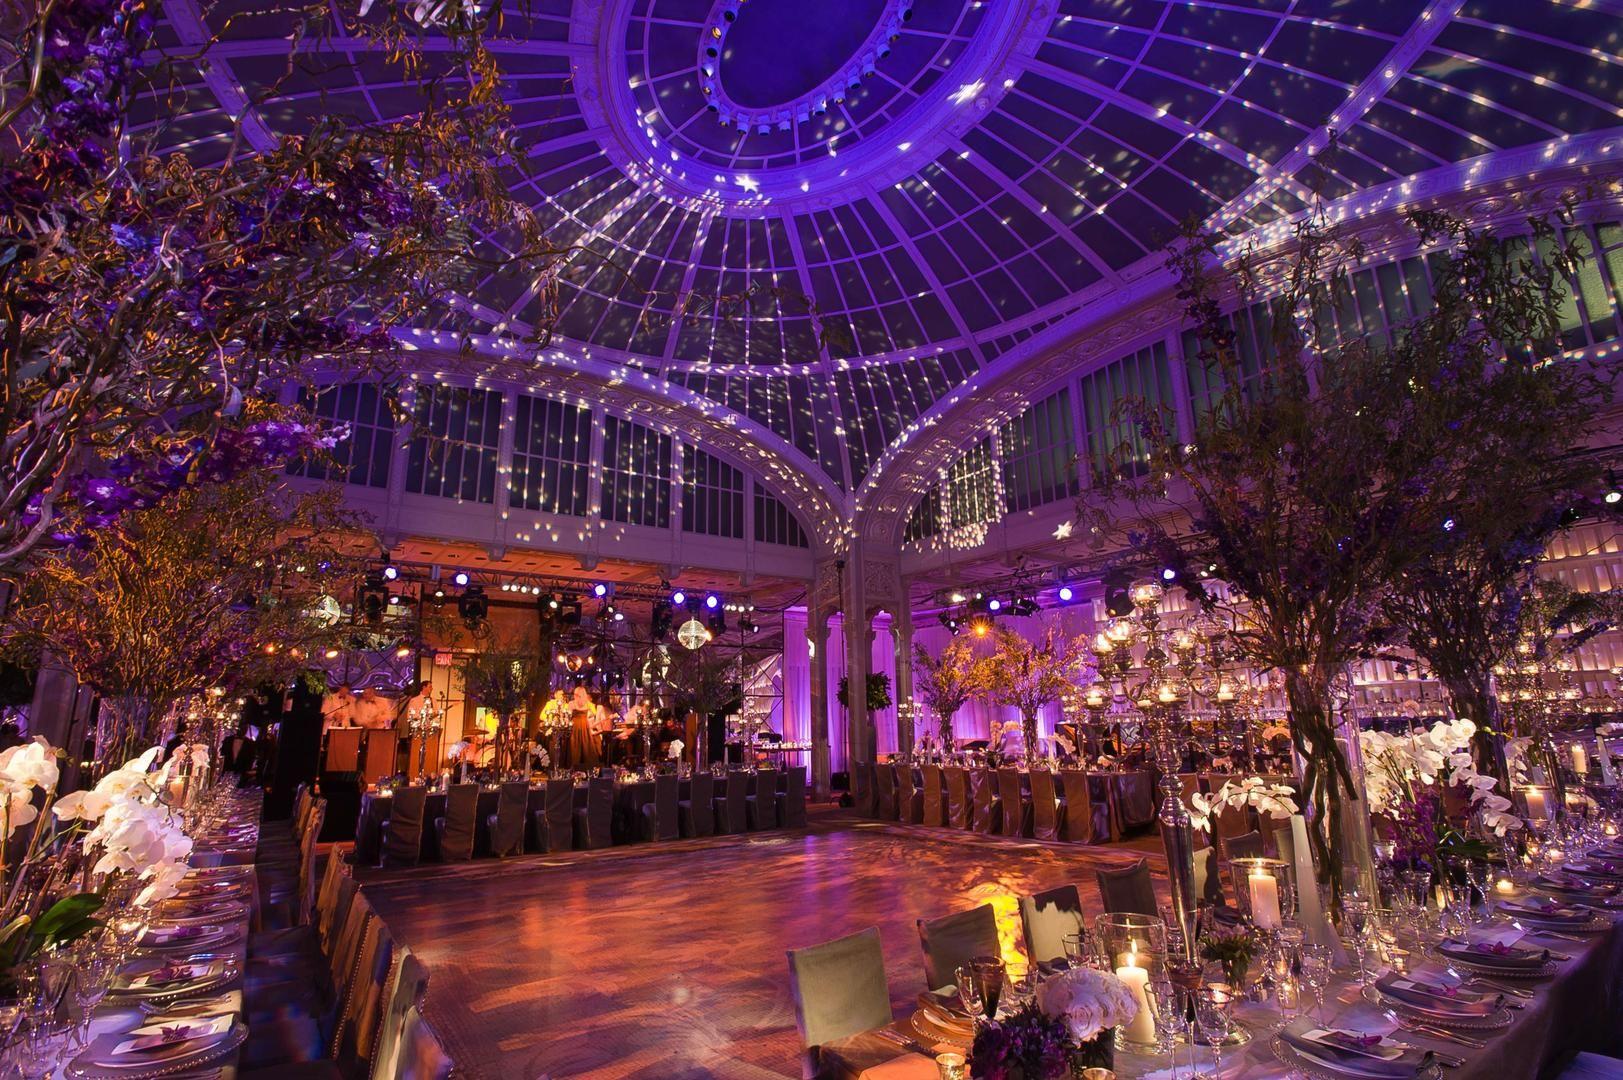 Wedding reception decoration ideas with lights  Dramatically Different Reception Centerpieces  Centerpieces